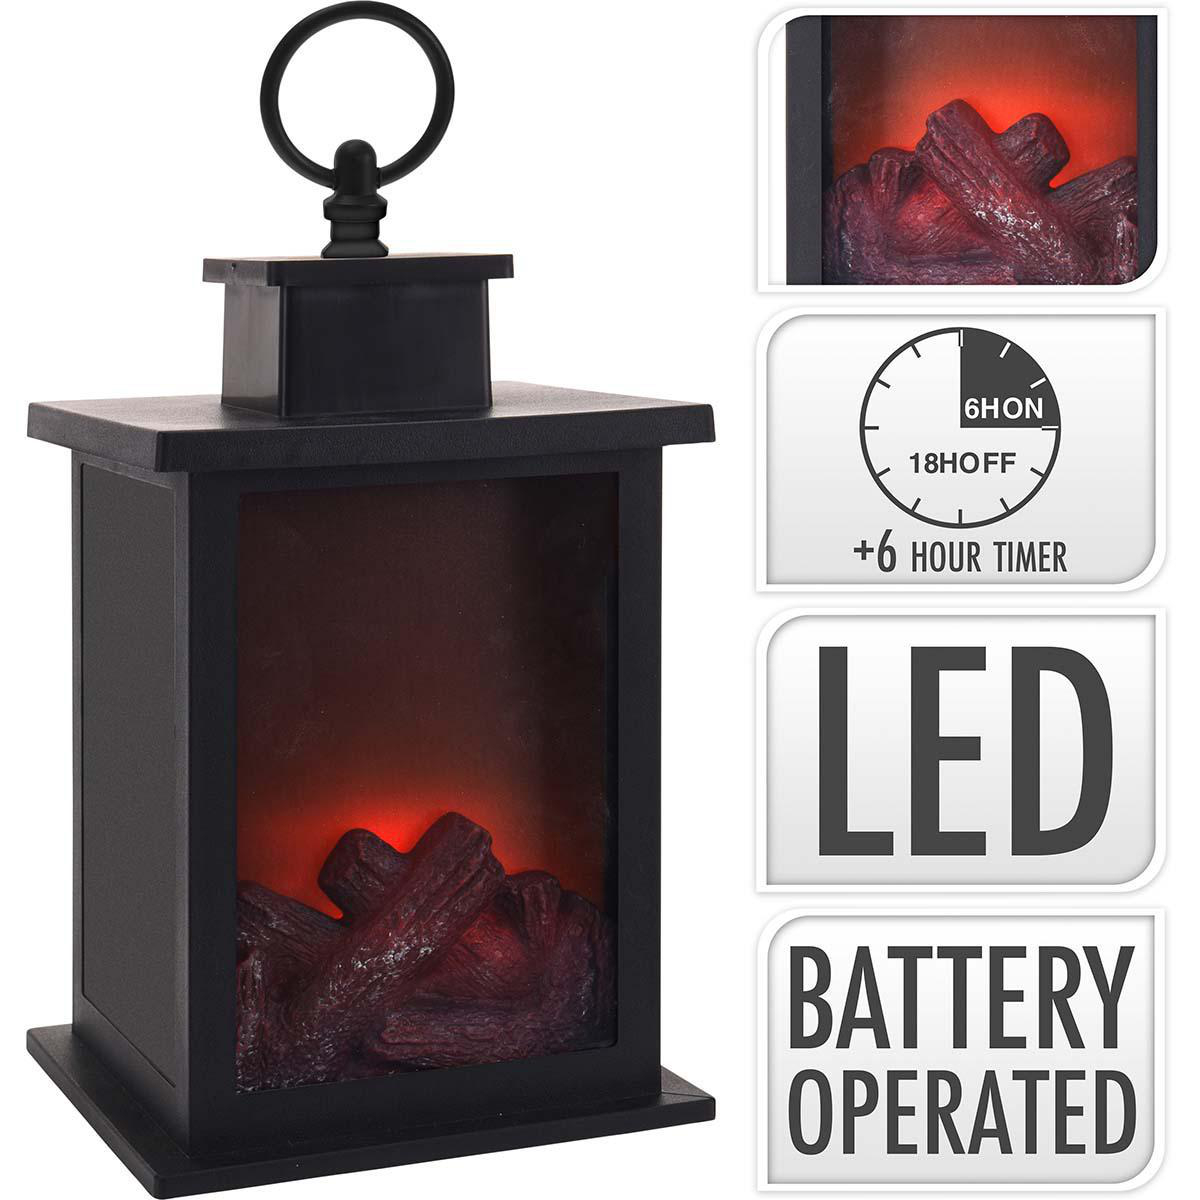 lantern-fireplace-led-24-cm-timer-battery-operated